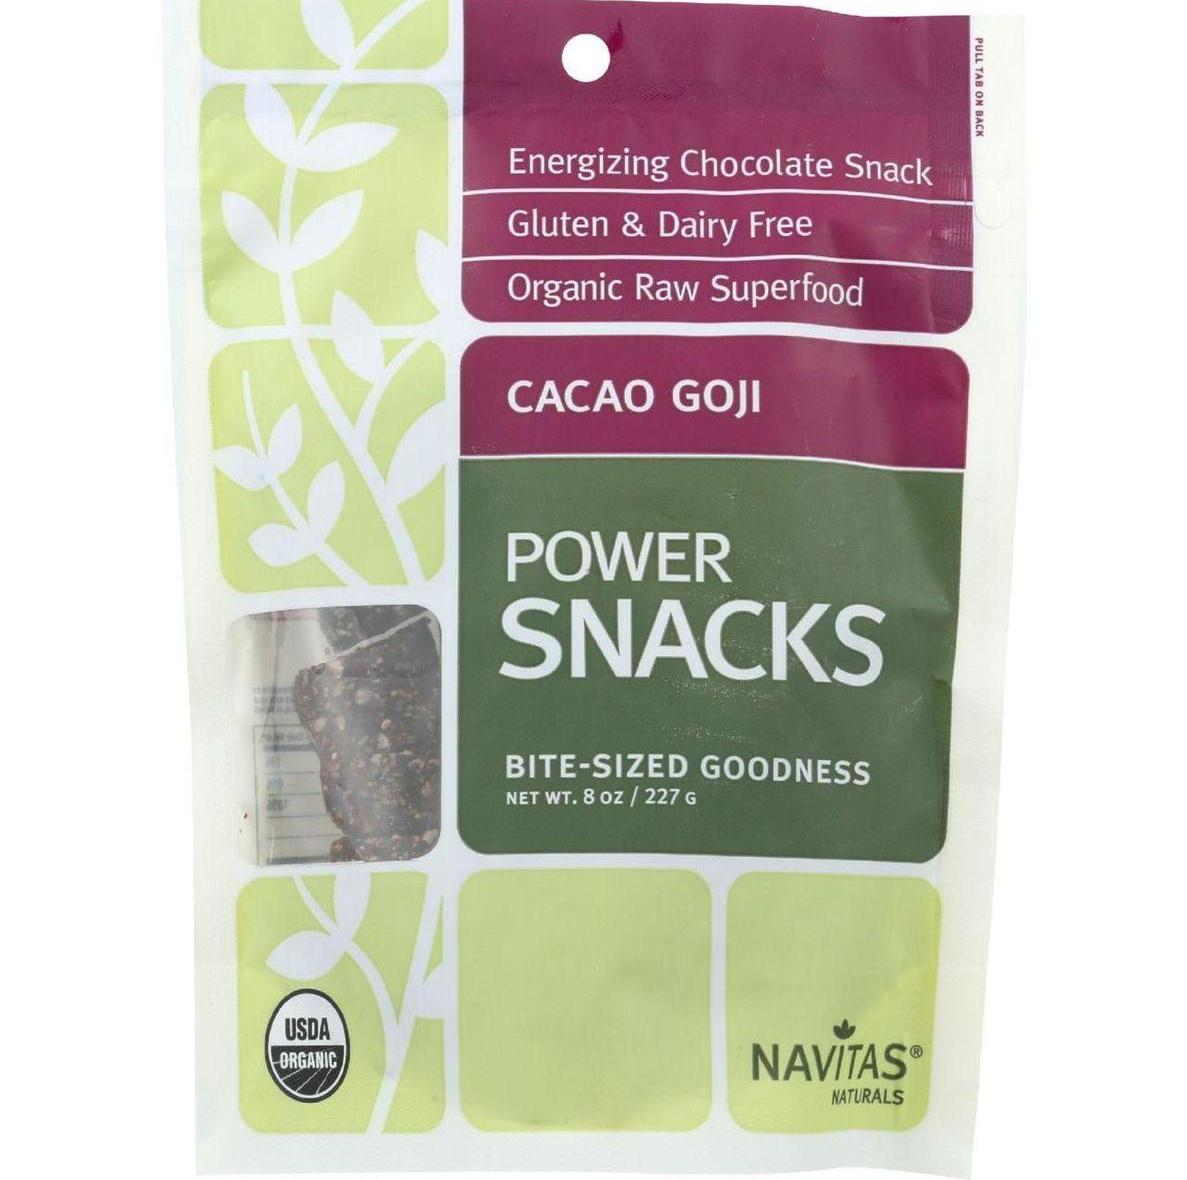 Navitas Naturals Snacks Organic Power Cacao Goji 8